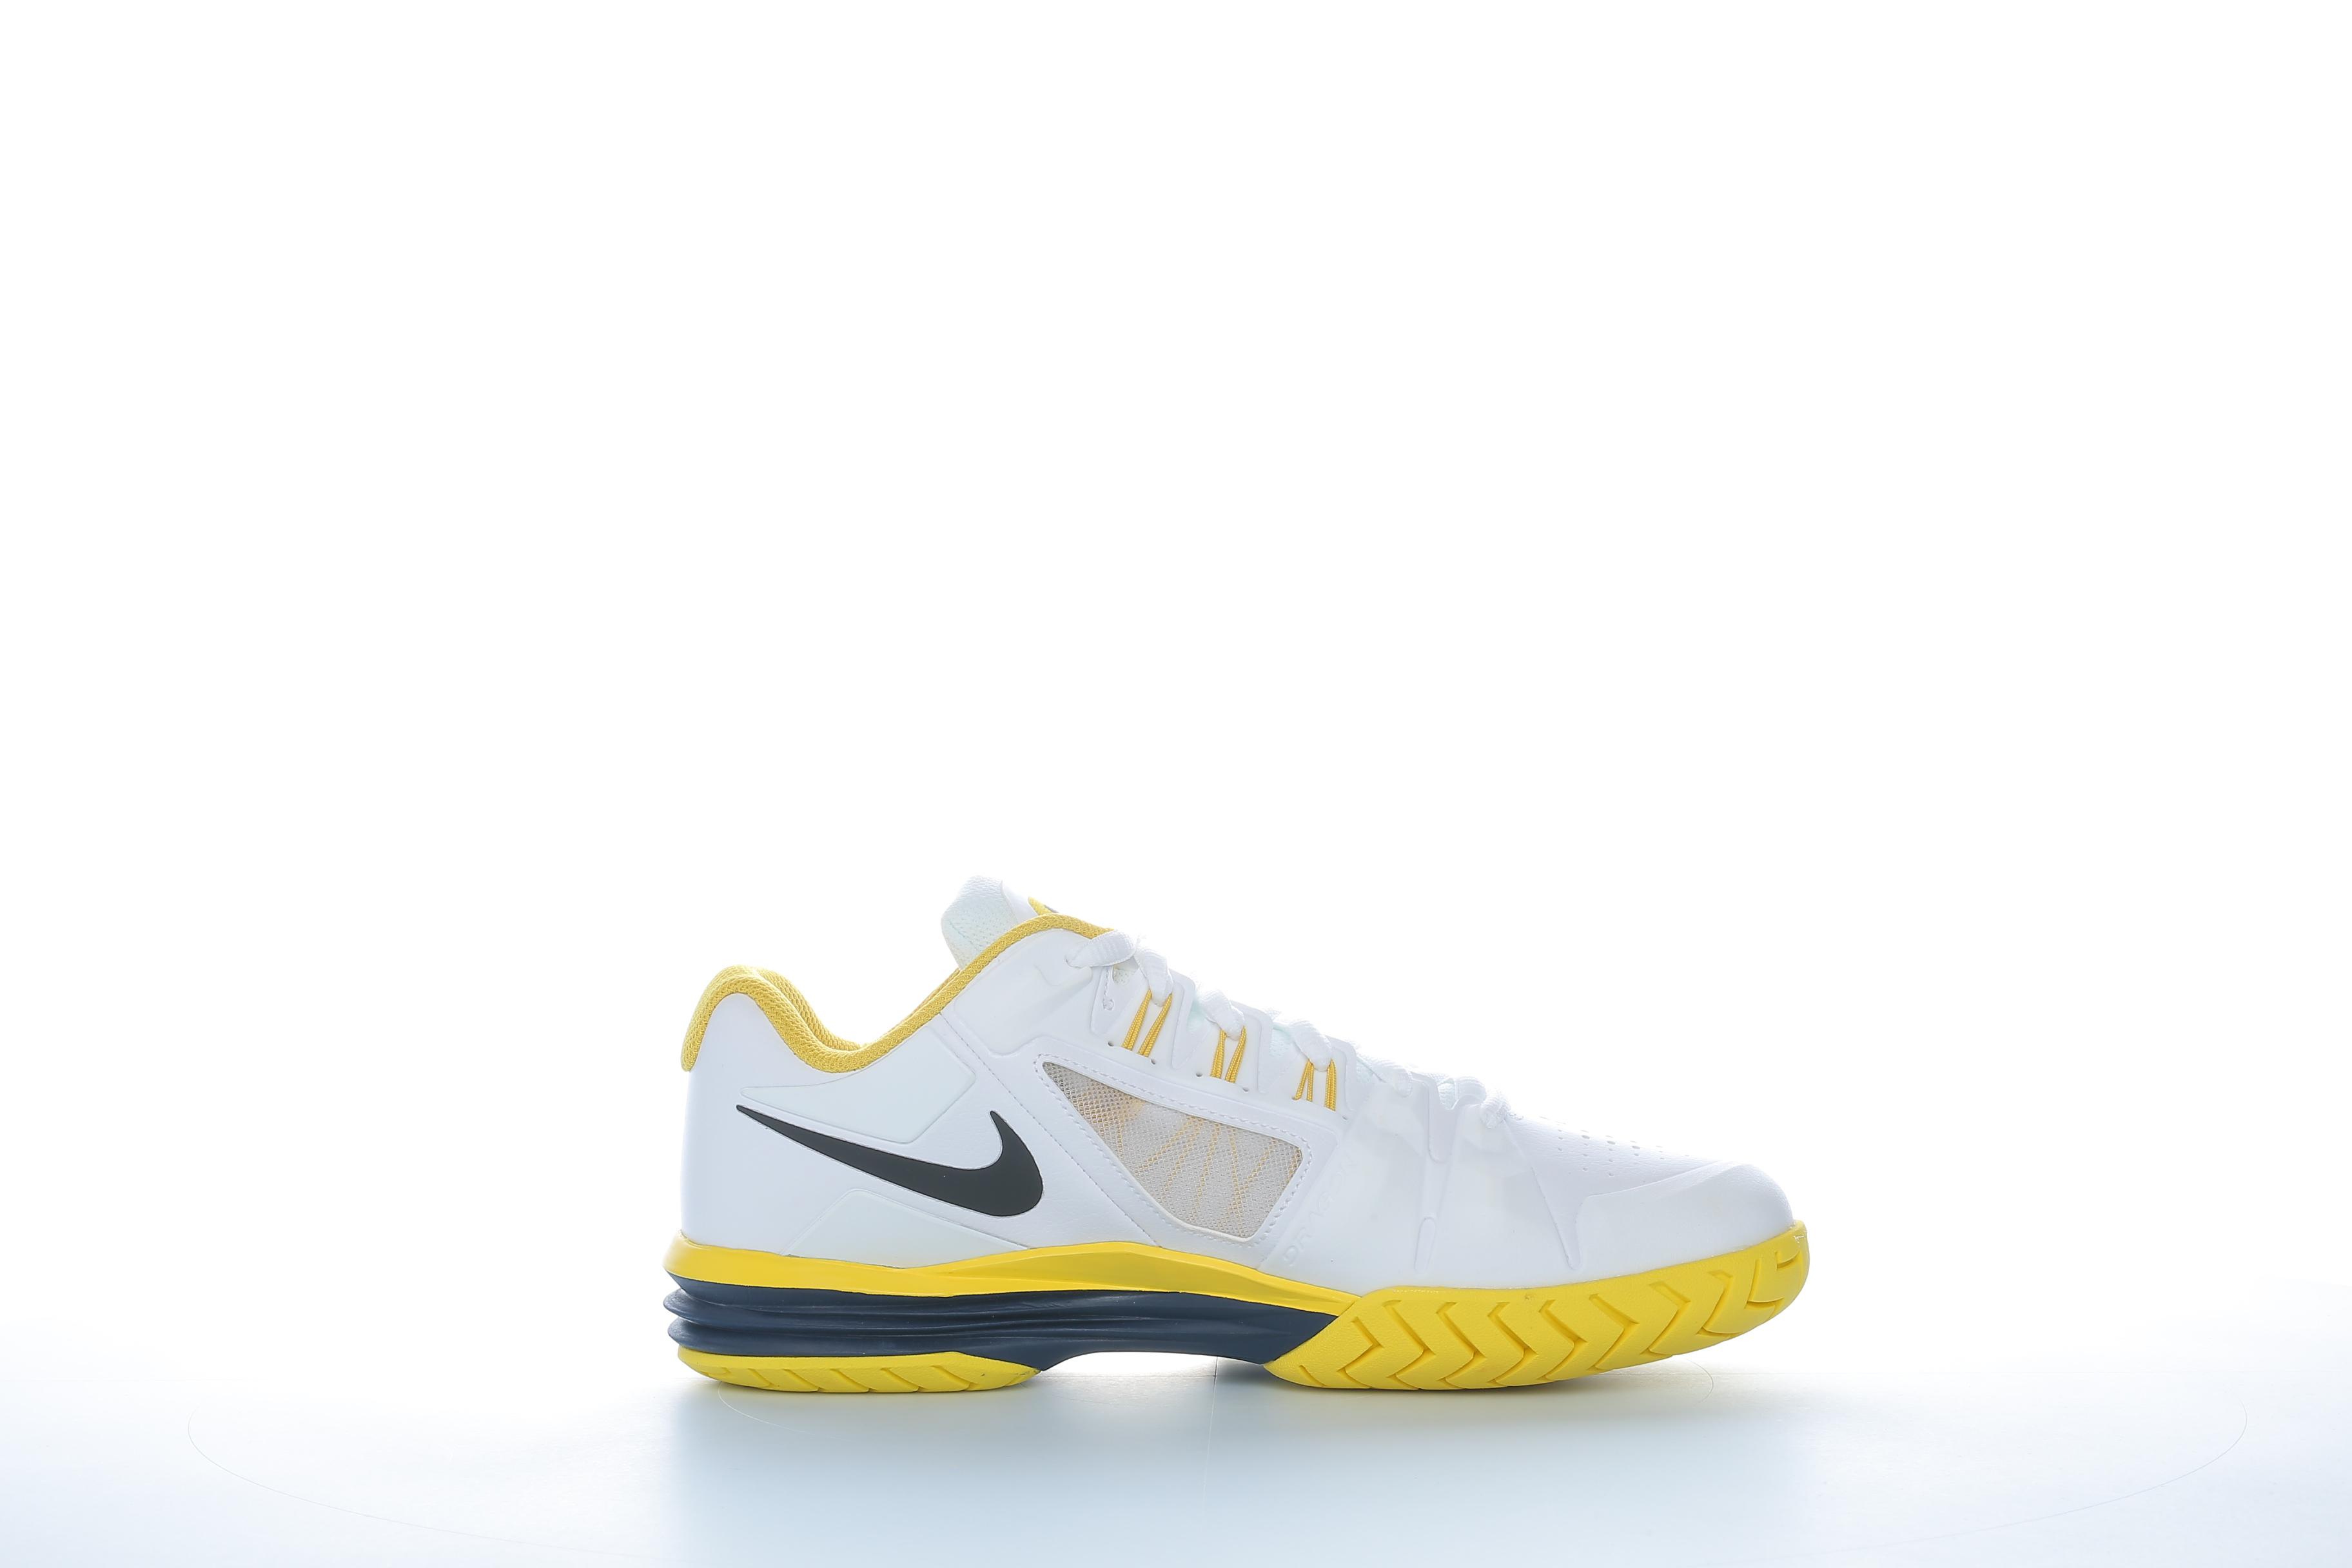 NIKE - Ανδρικά παπούτσια τέννις Nike LUNAR BALLISTEC 1.5 λευκά-κίτρινα ανδρικά παπούτσια αθλητικά tennis